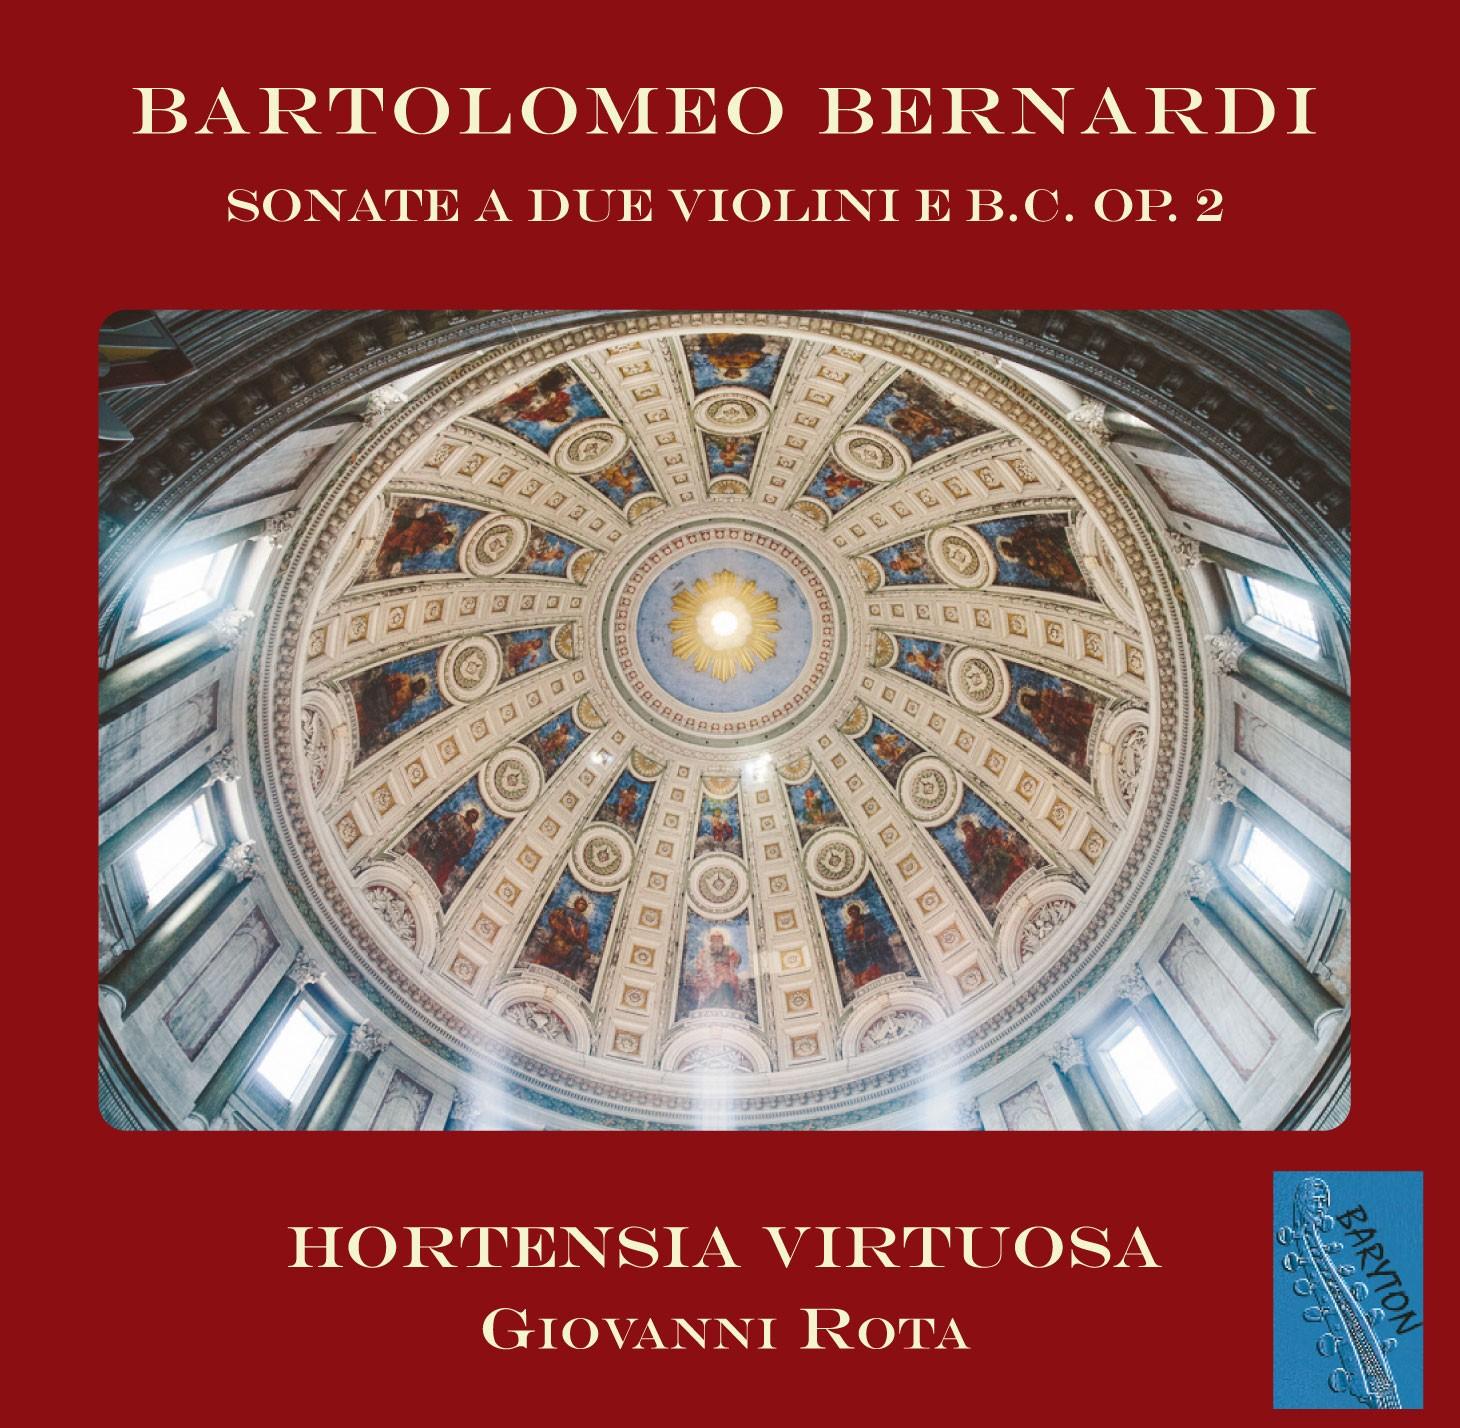 Bartolomeo Bernardi